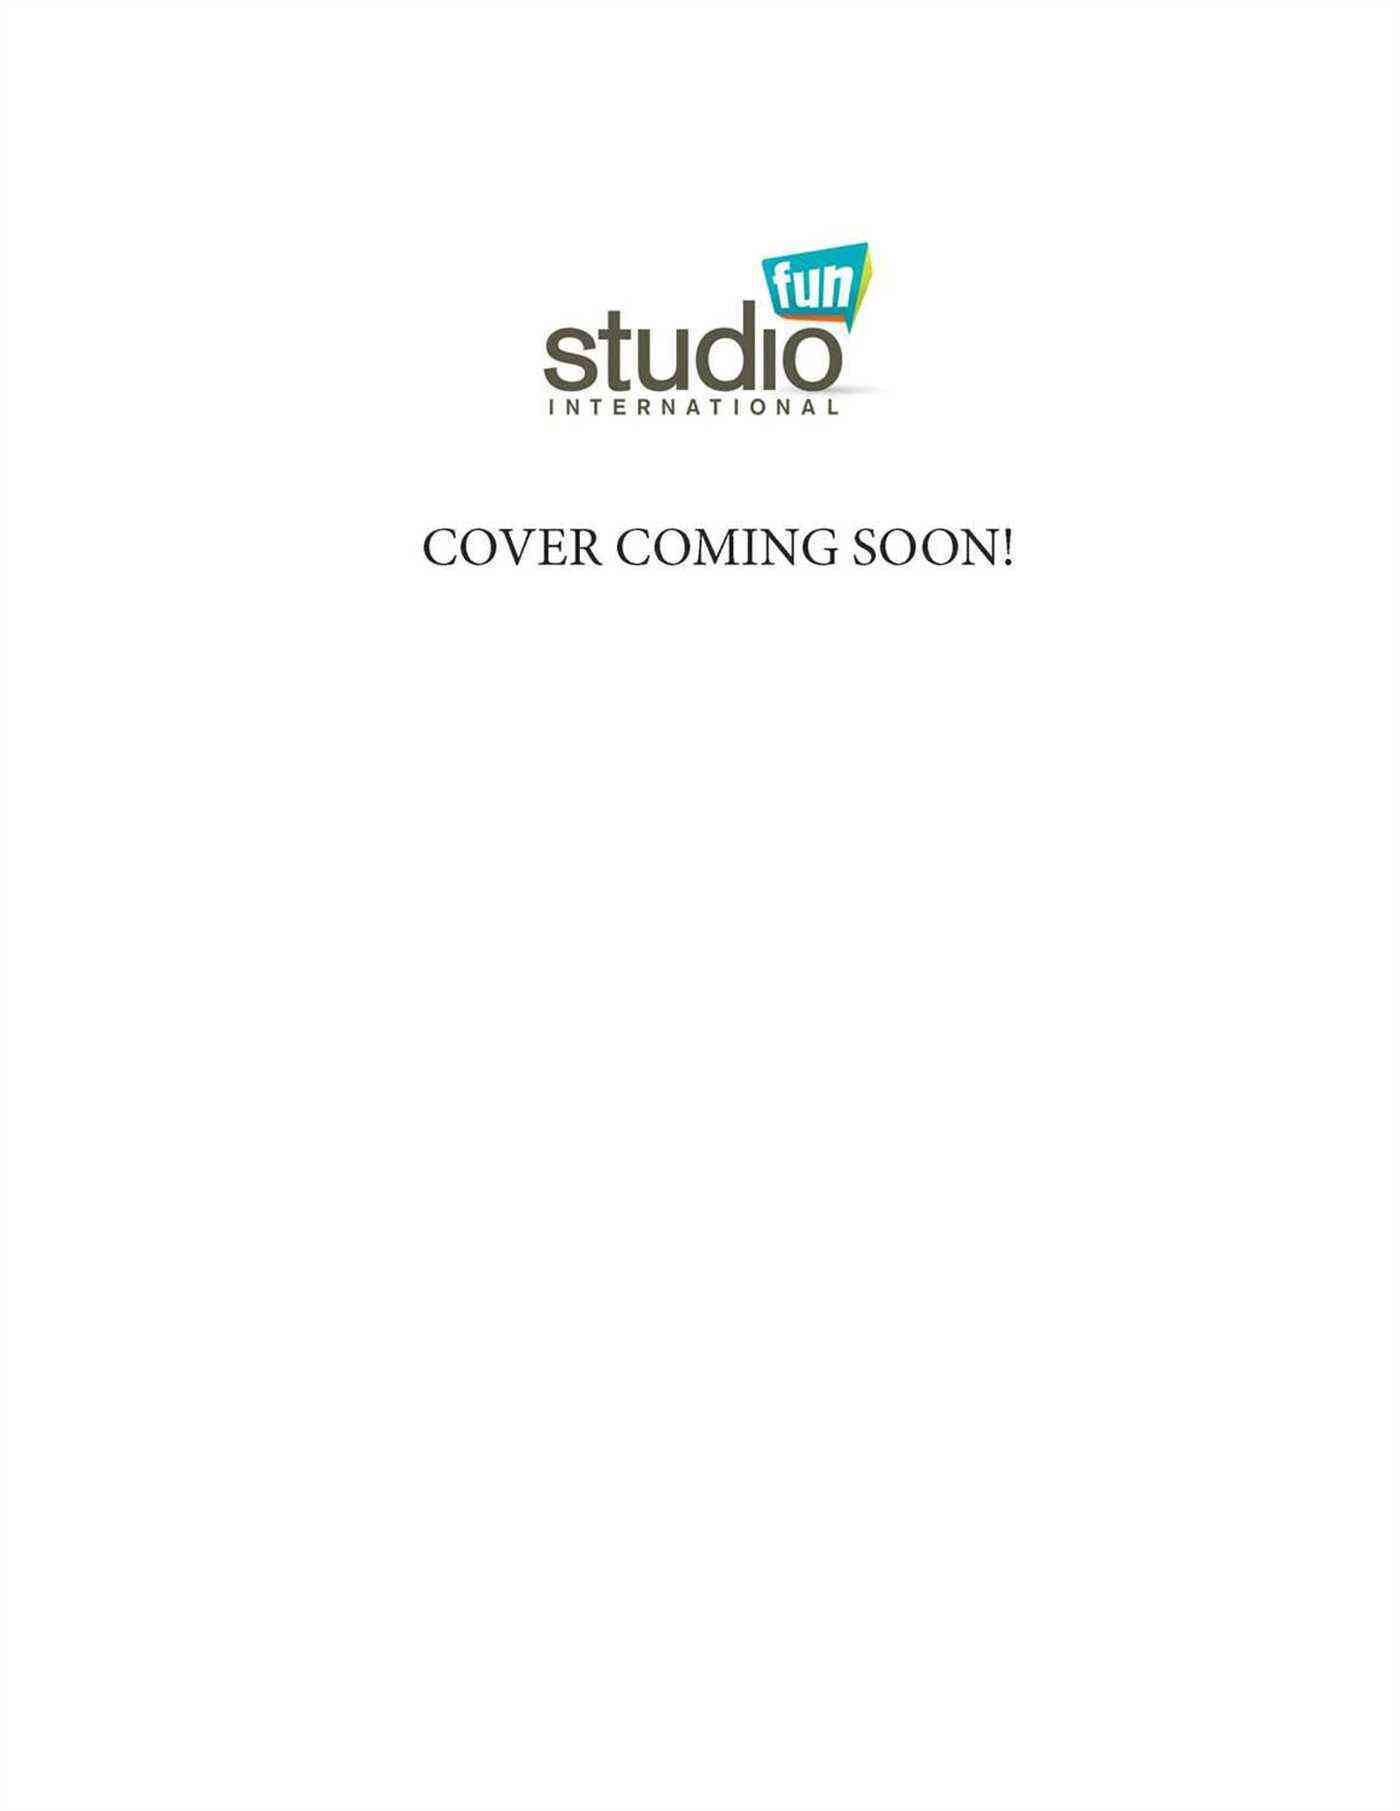 Disney Doc Mcstuffins Carryalong Play Book By Disney (COR)